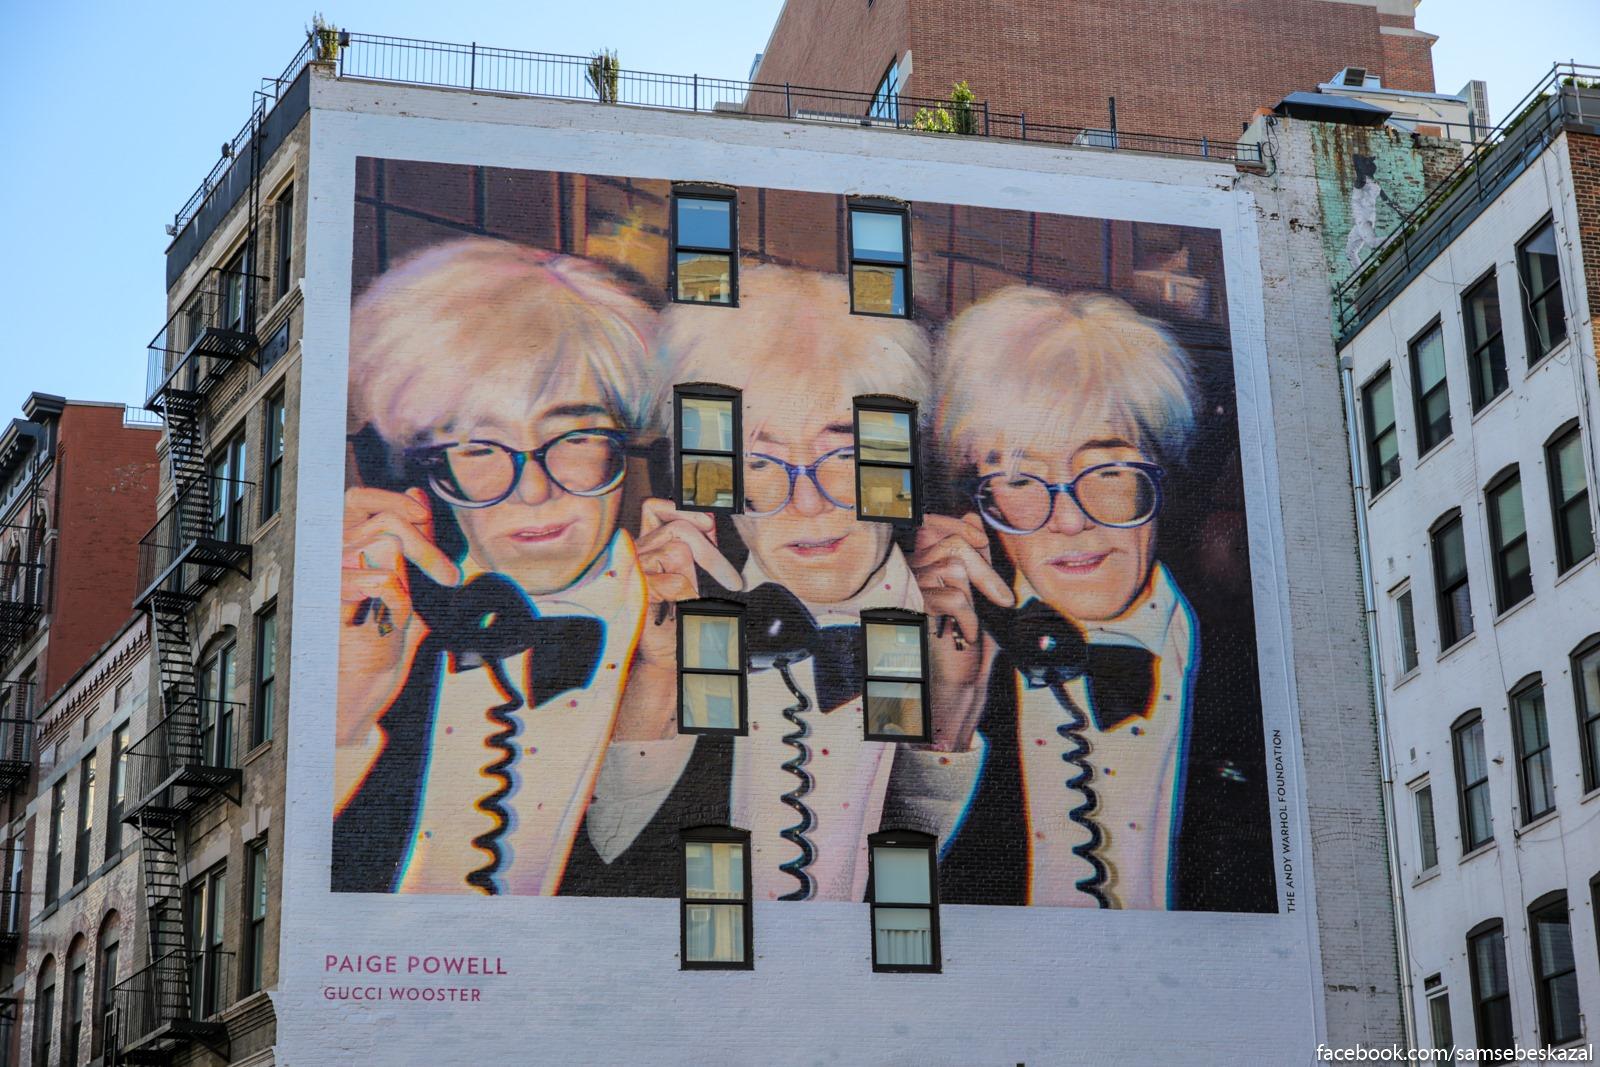 Risovannaa reklama posvasennaa vypusku serii fotoalʹbomov Pejdz Pauell na stene GucciArtWall v Manhettene.